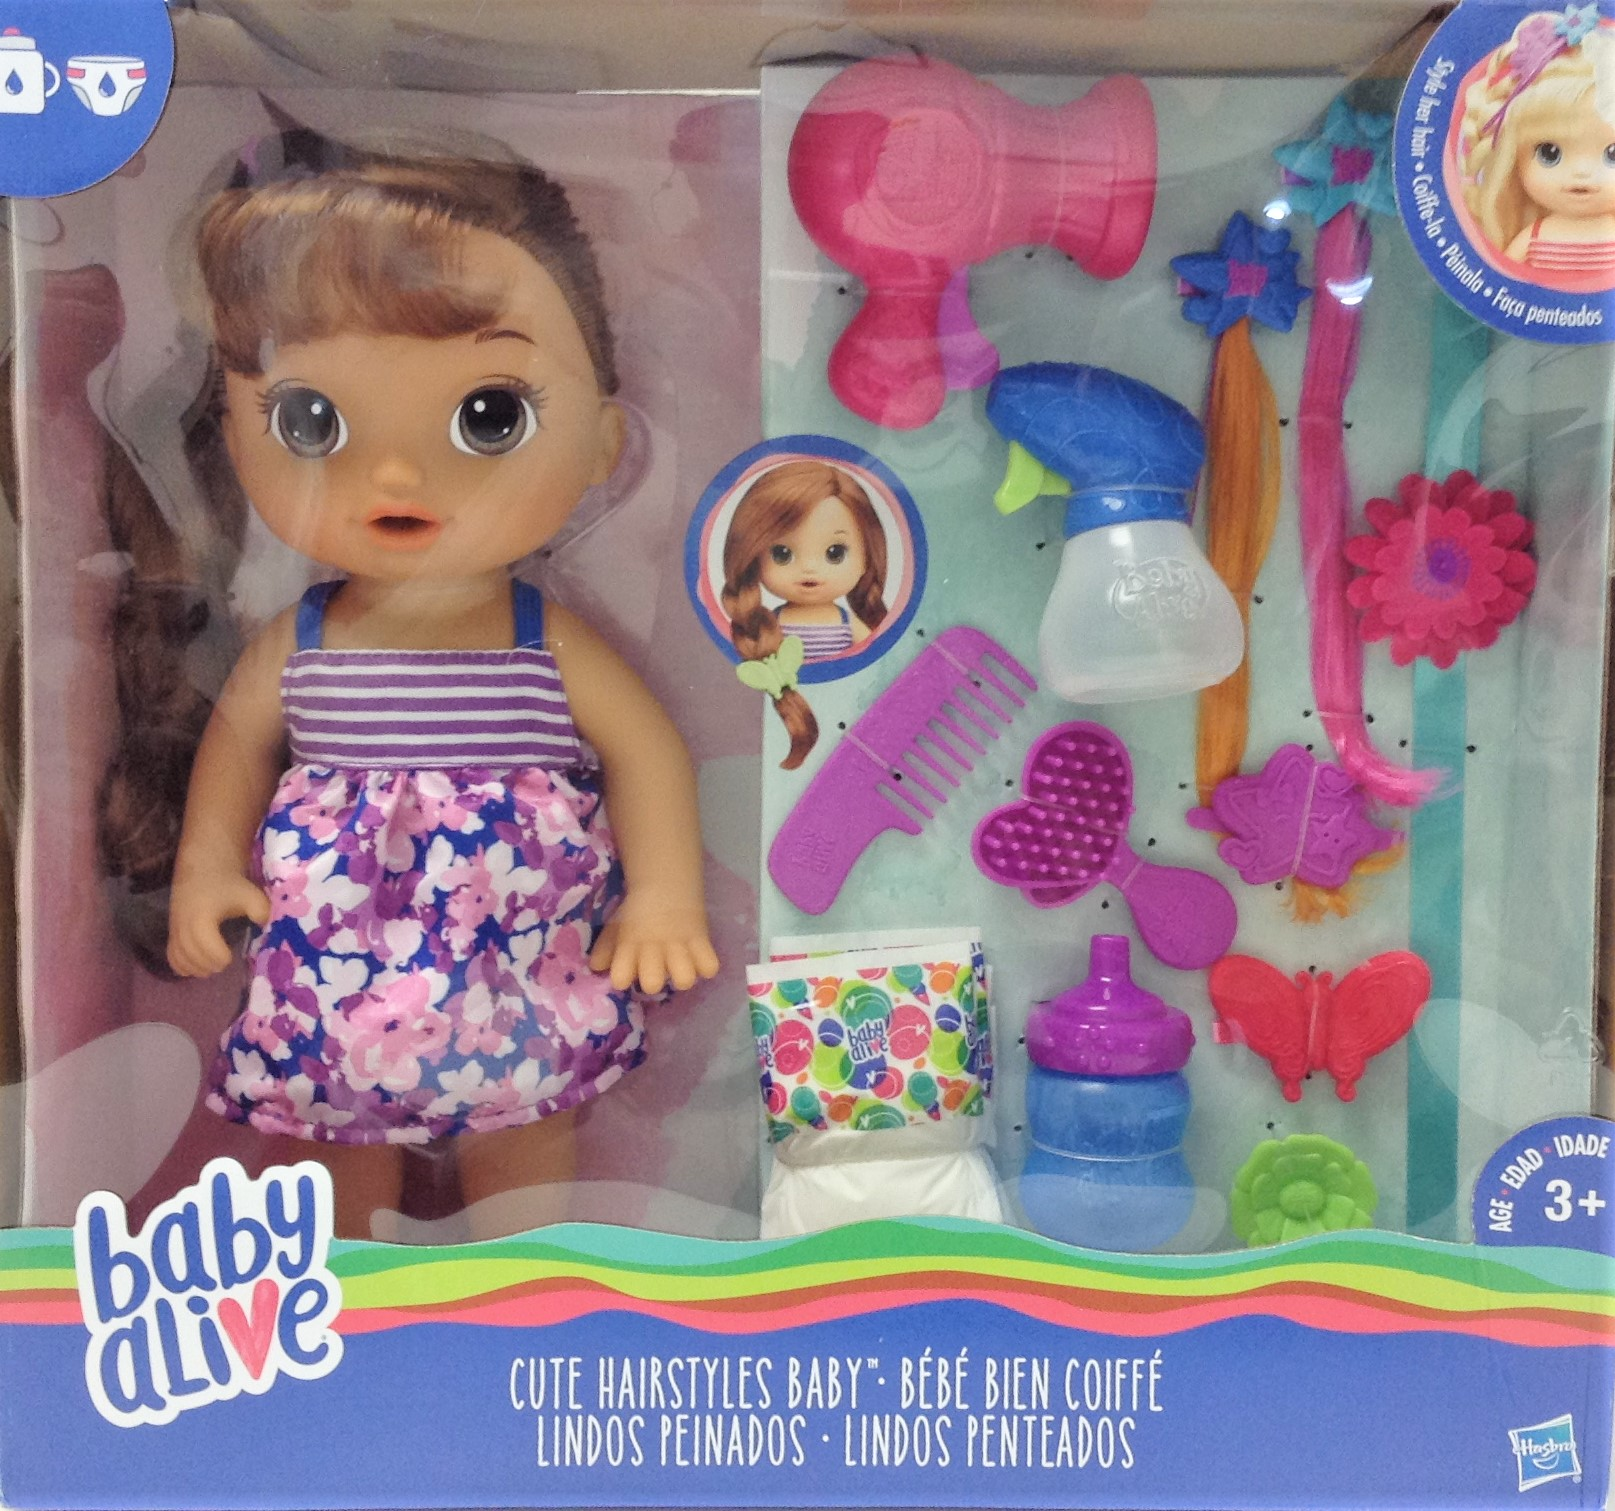 Biy Alive Cute Hairstyles Biy (Brunette) - Walmart.com - Walmart.com